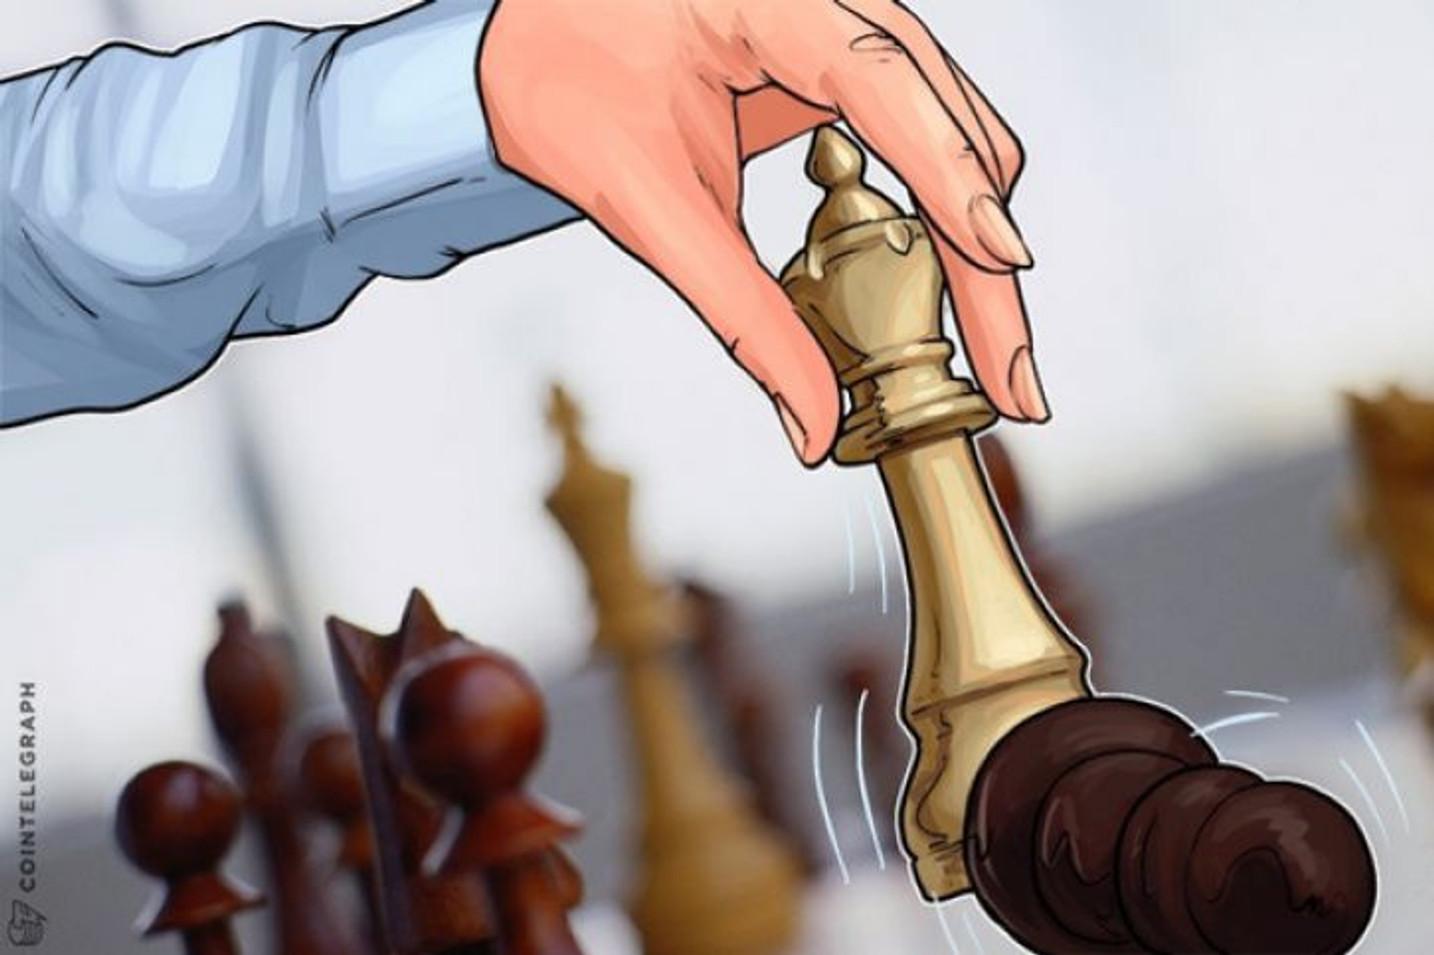 Texas Regulator Orders Bitconnect to Cease and Desist Marketing 'Securities'